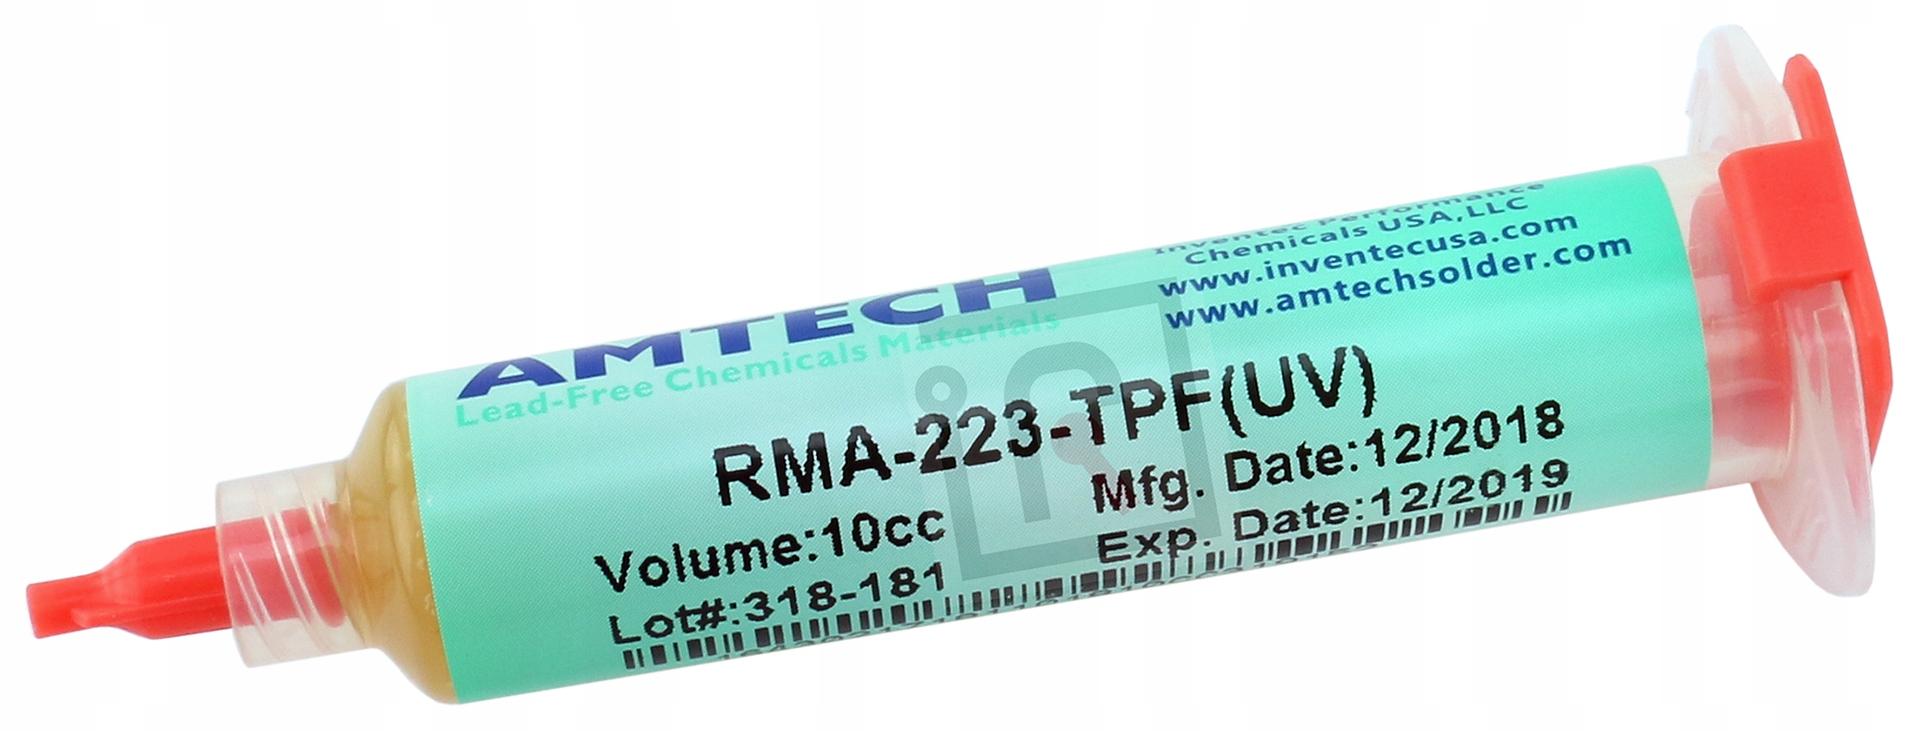 FLUX ФЛЮС BGA SMD AMTECH RMA-223-TPF(УФ) 10g